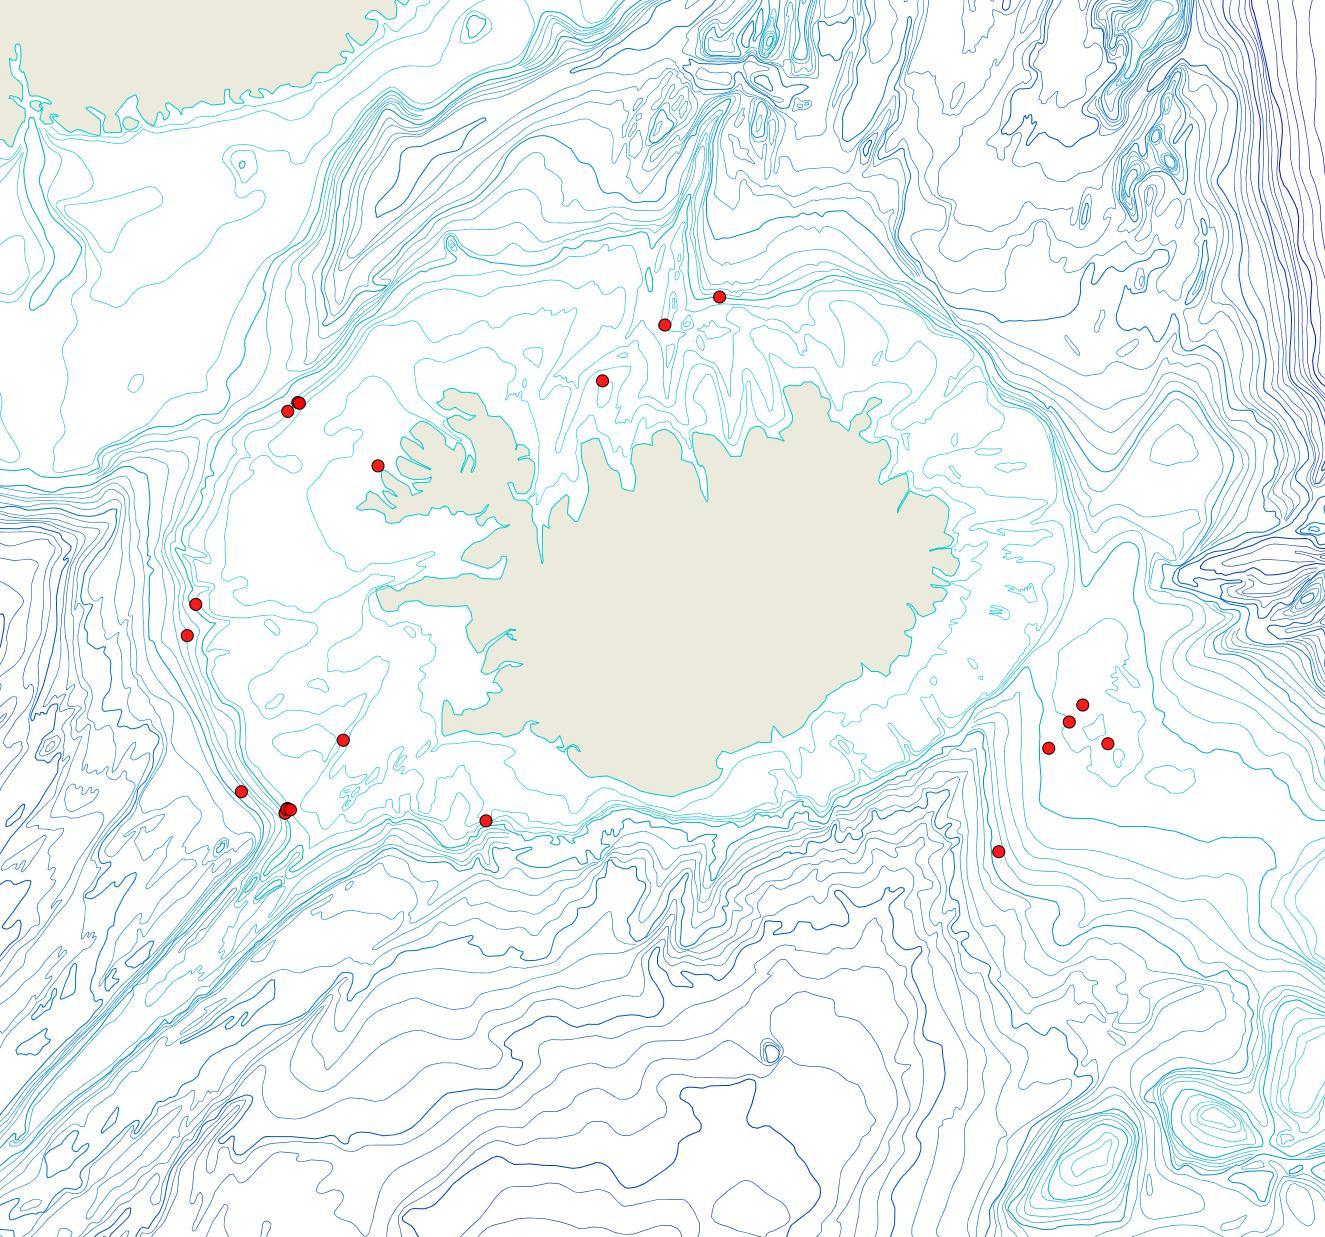 Útbreiðsla Hemicyclopora polita(Bioice samples, red dots)